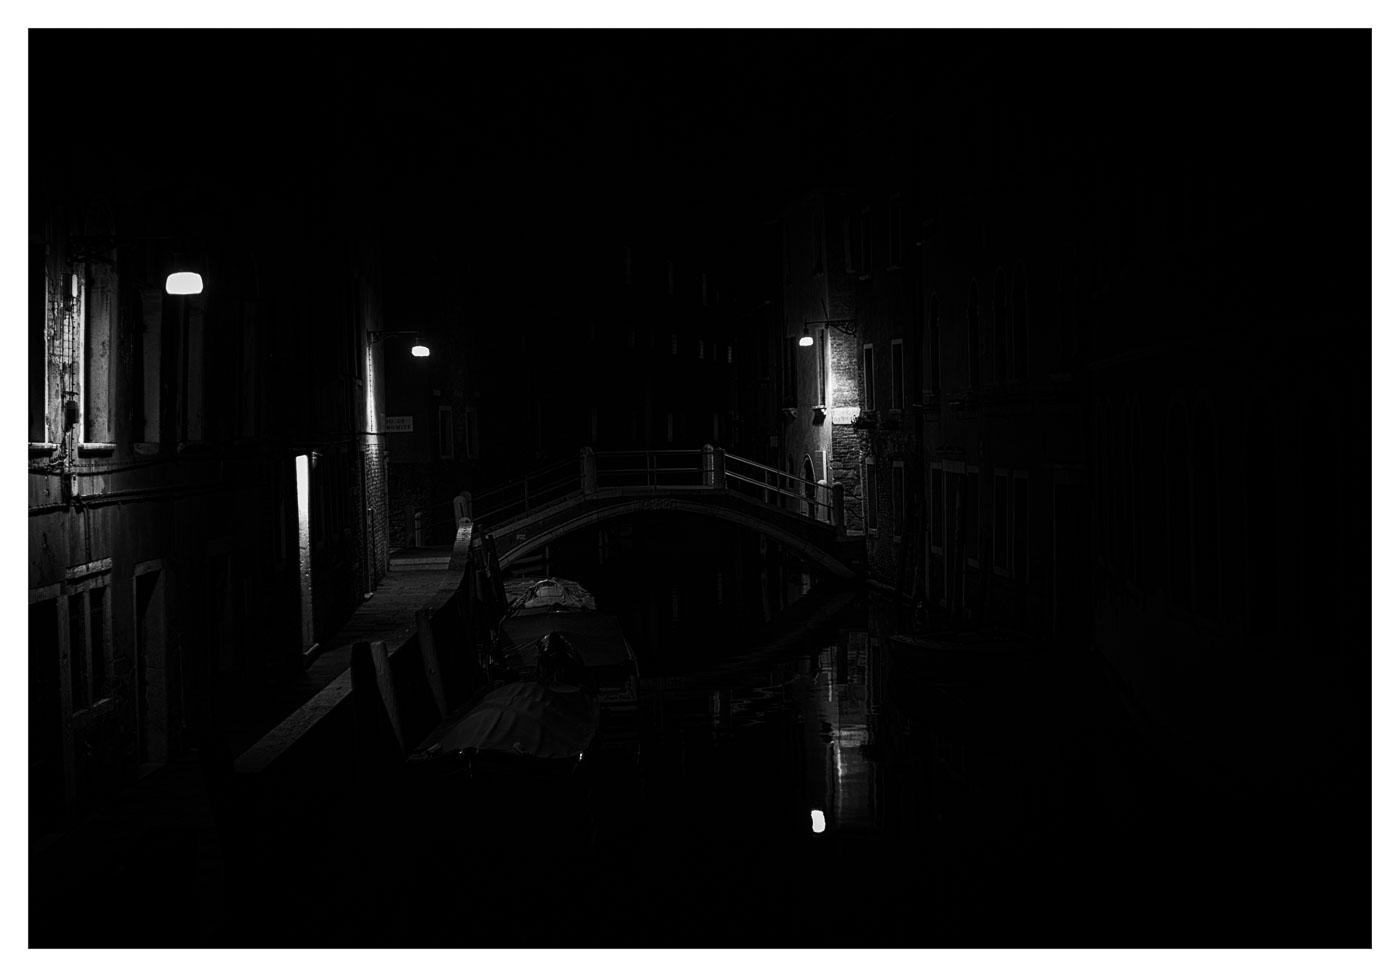 Venice Available Light (2015)